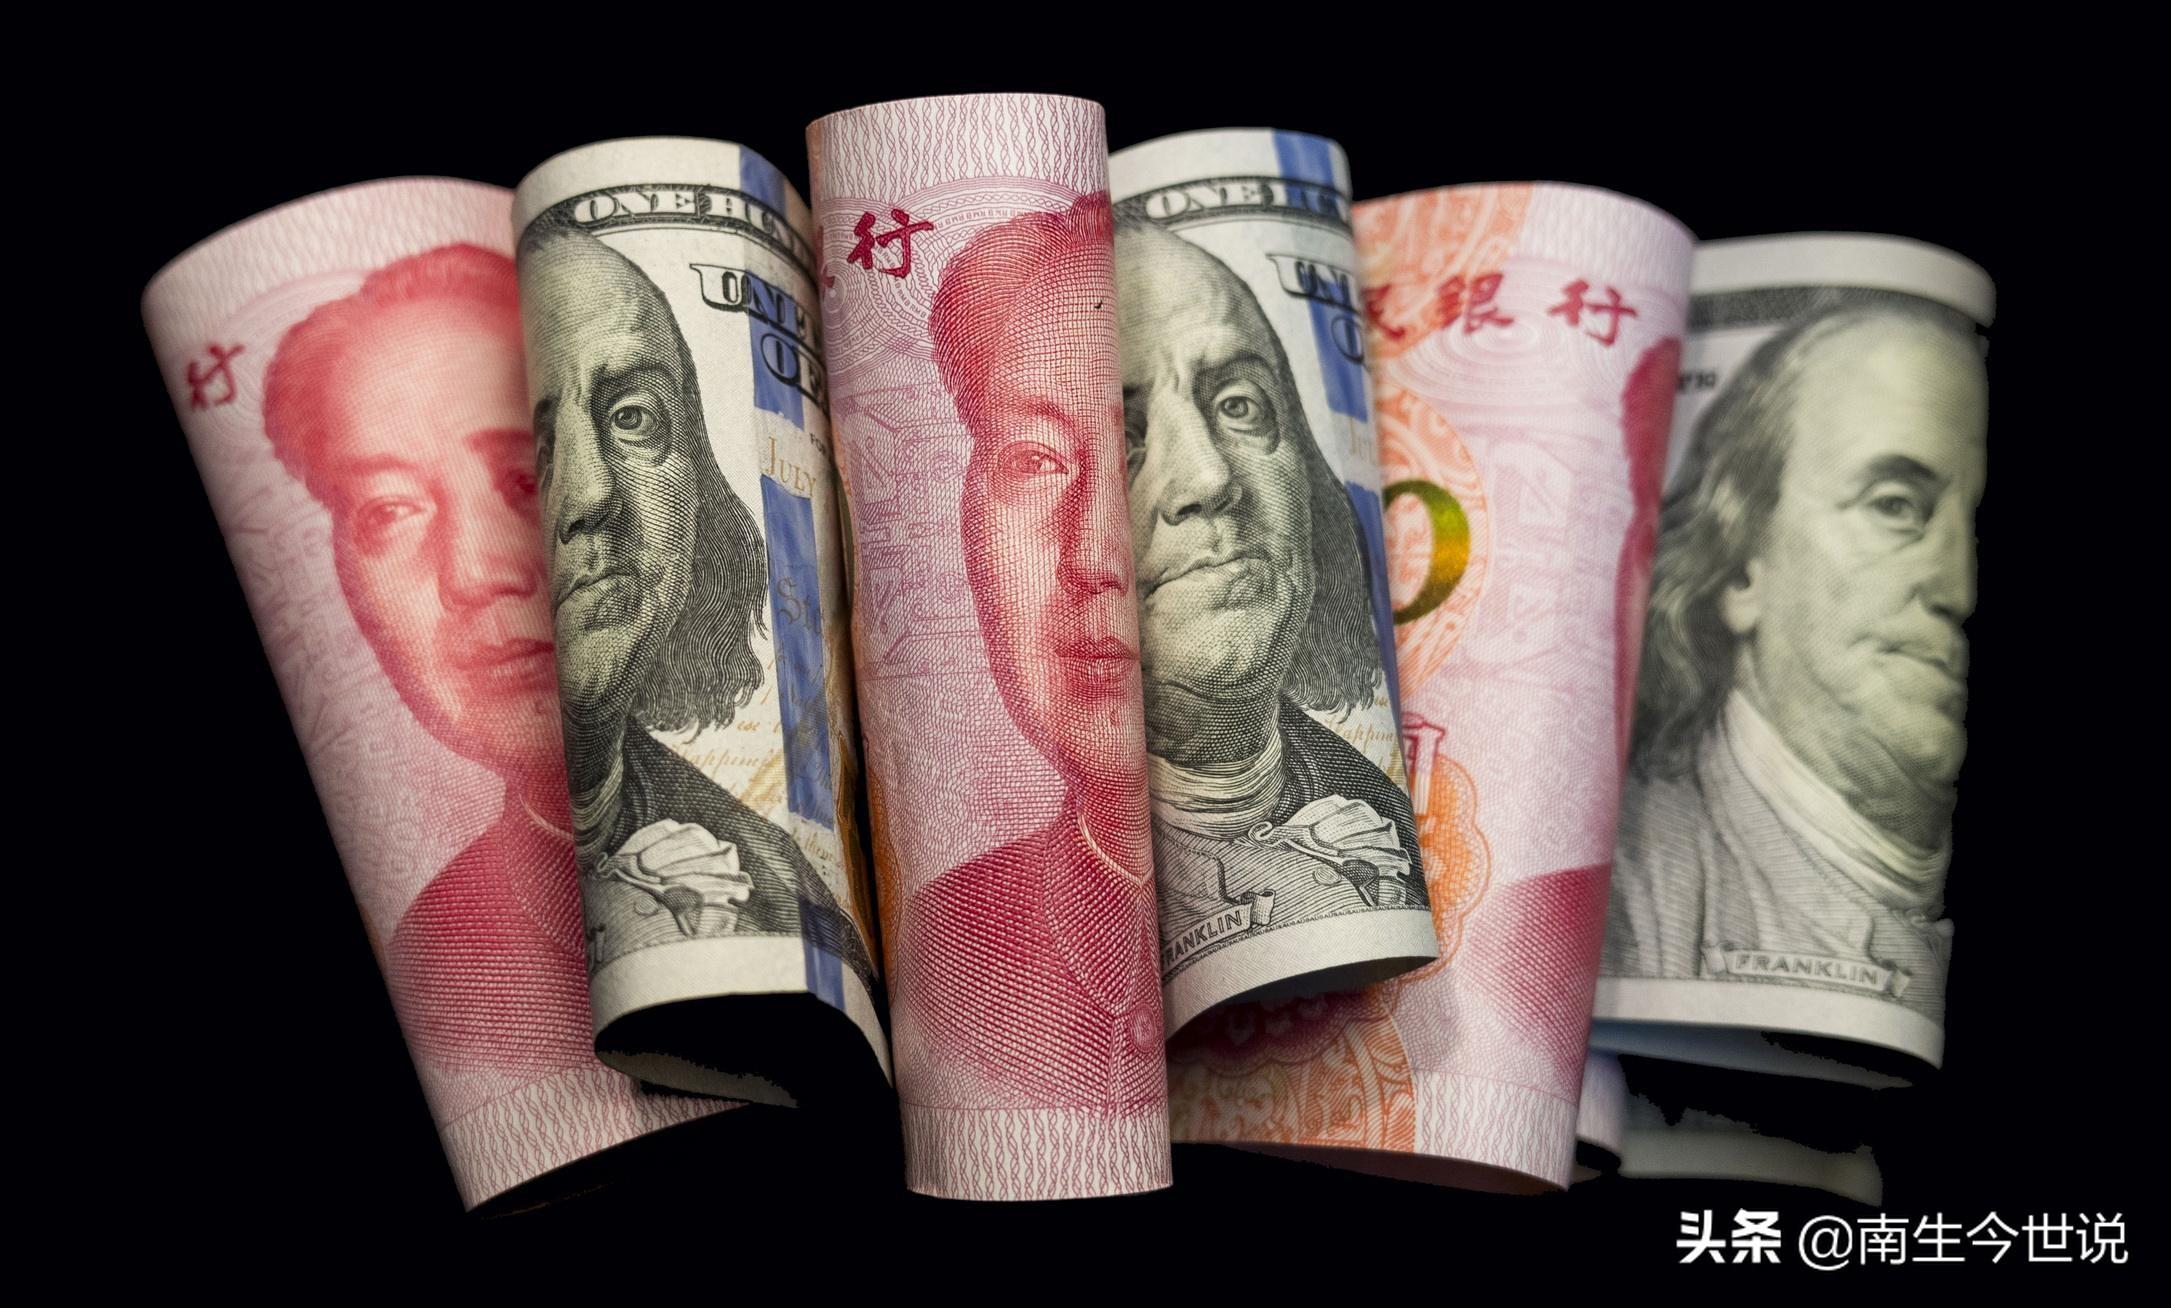 GDP或达到美国75%?瑞银看好下半年中国经济,预计今年将增长2.5%